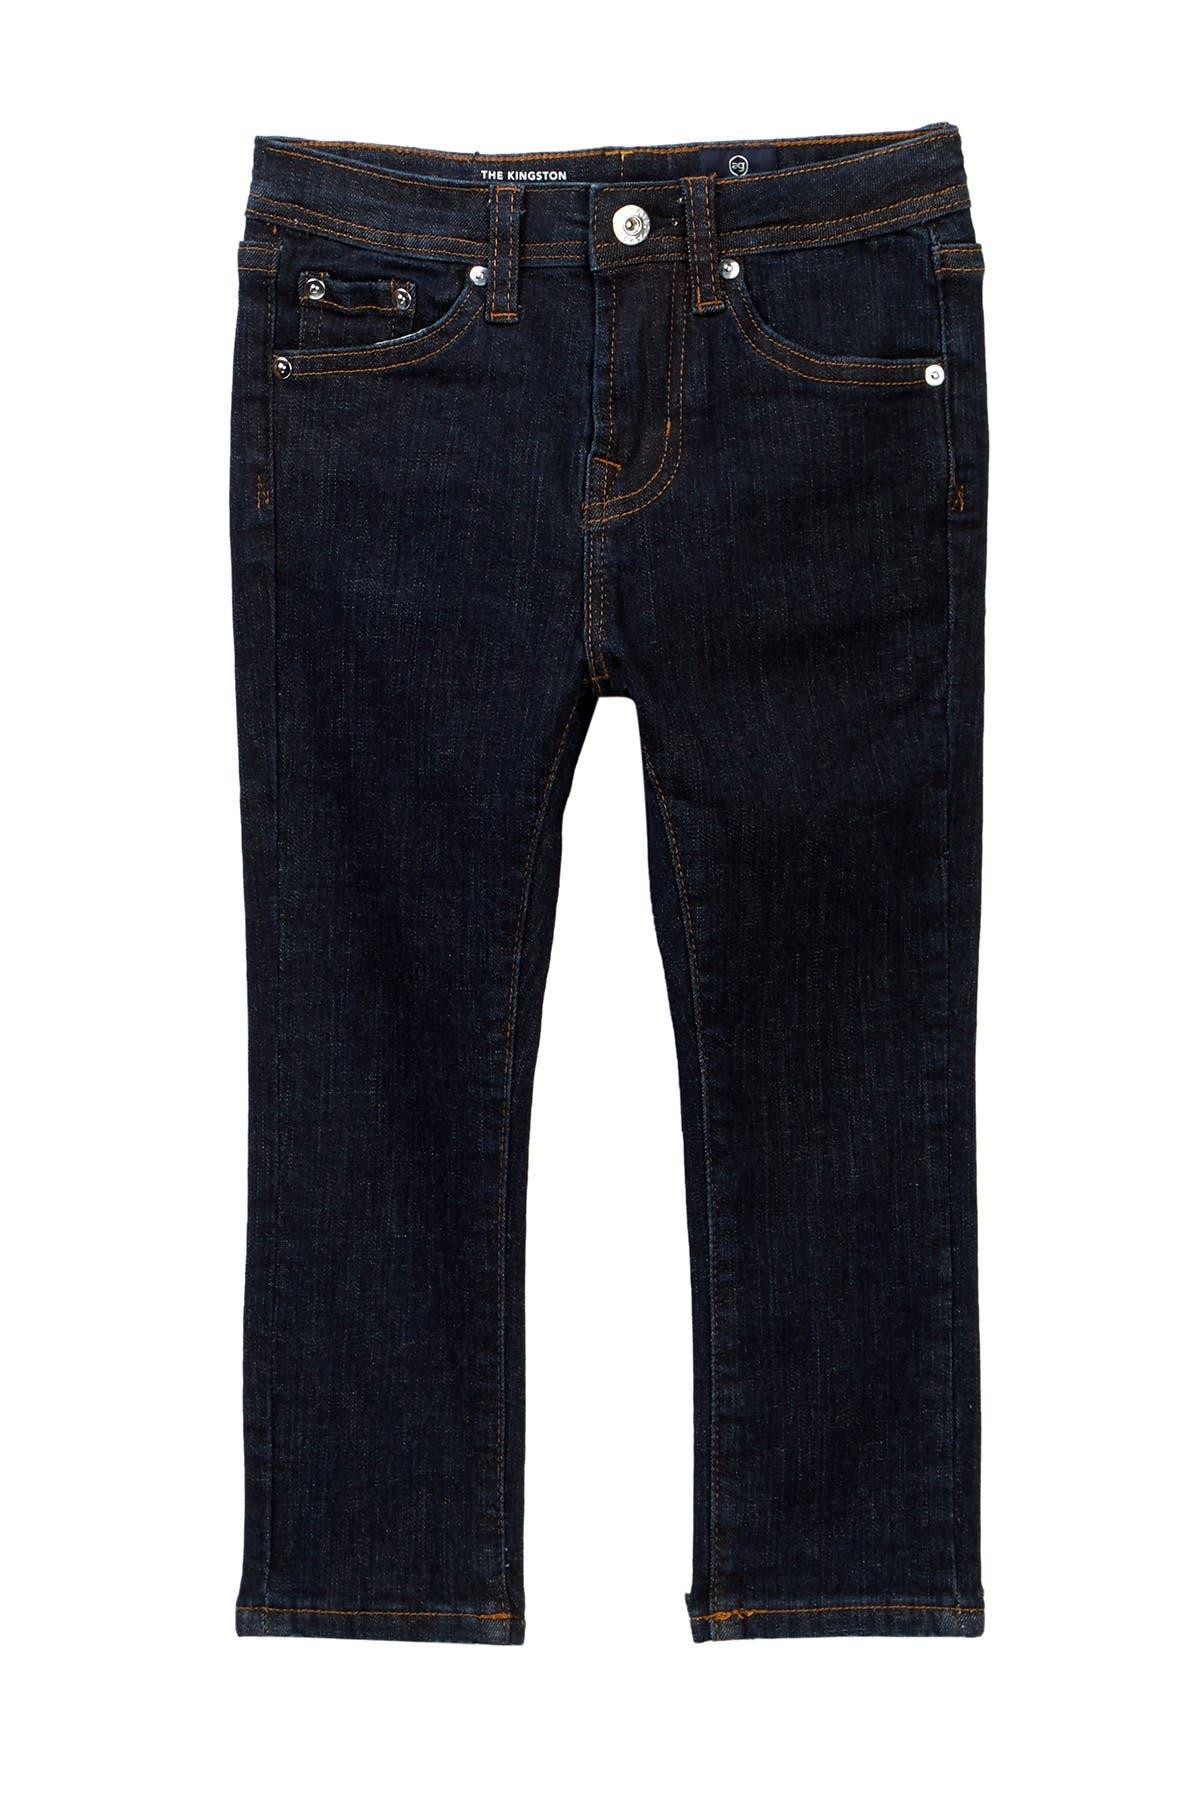 Image of AG The Kingston Slim Skinny Jeans